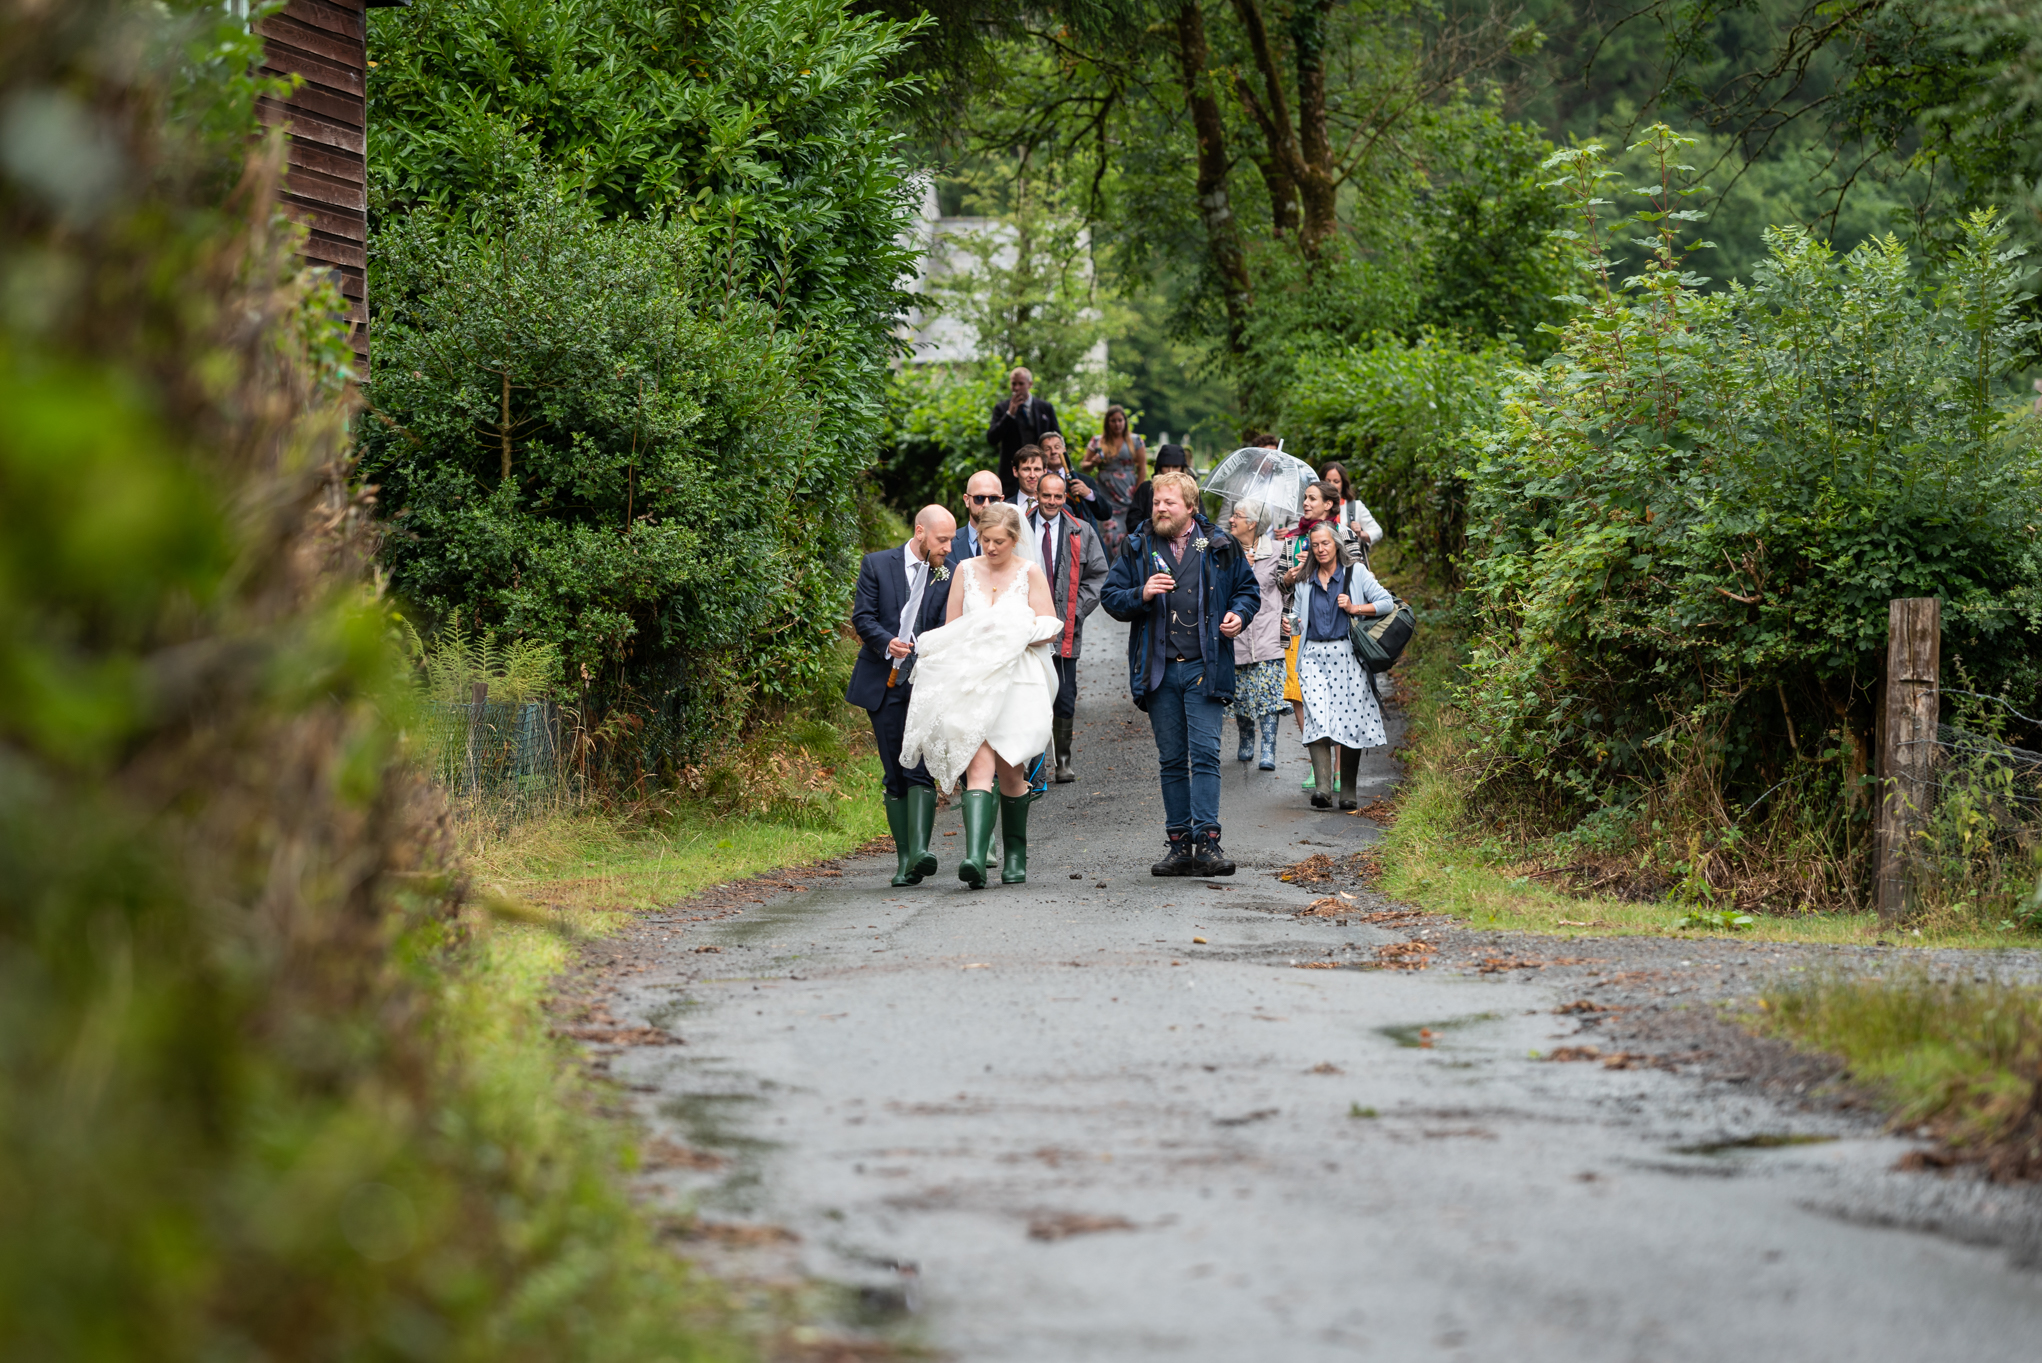 Wedding guests walking - Powys Wedding Photography